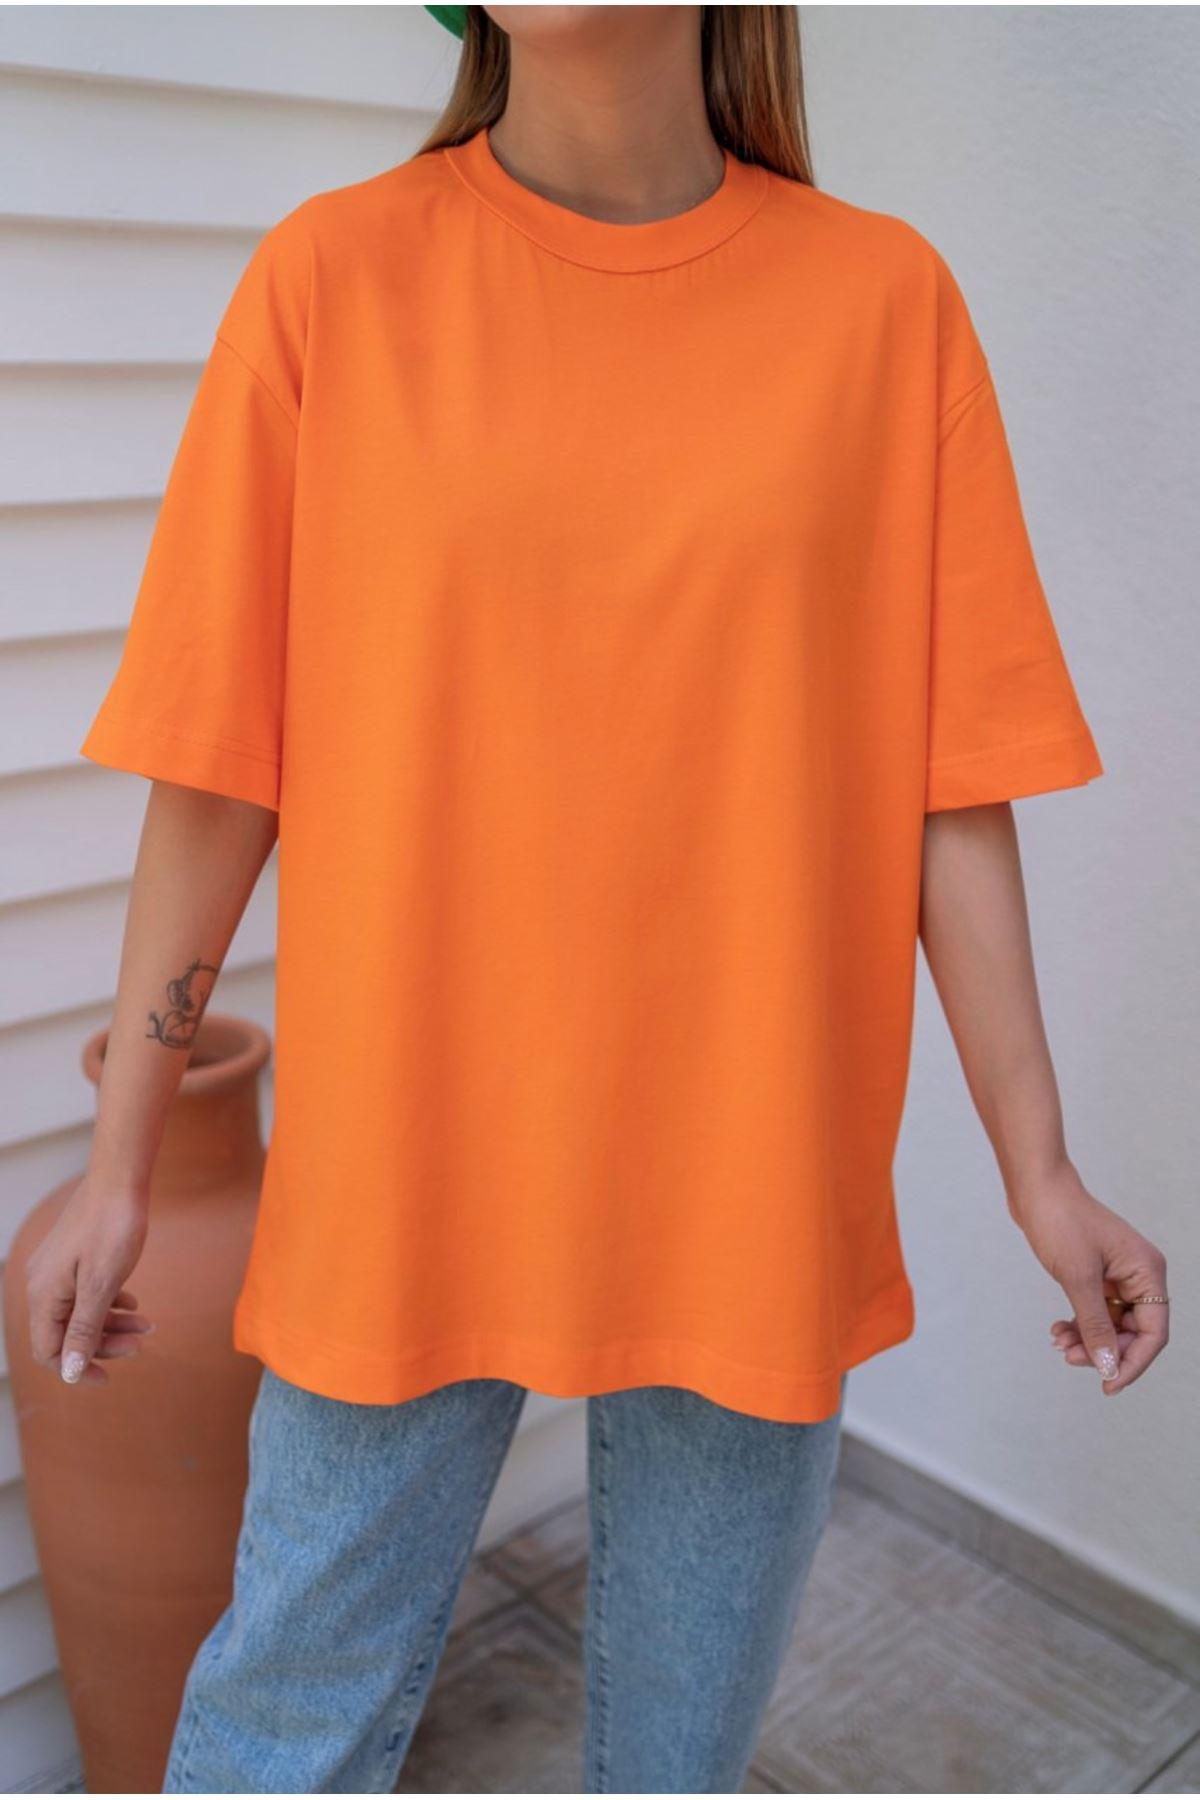 Turuncu yaka dikiş detaylı oversize basic tshirt